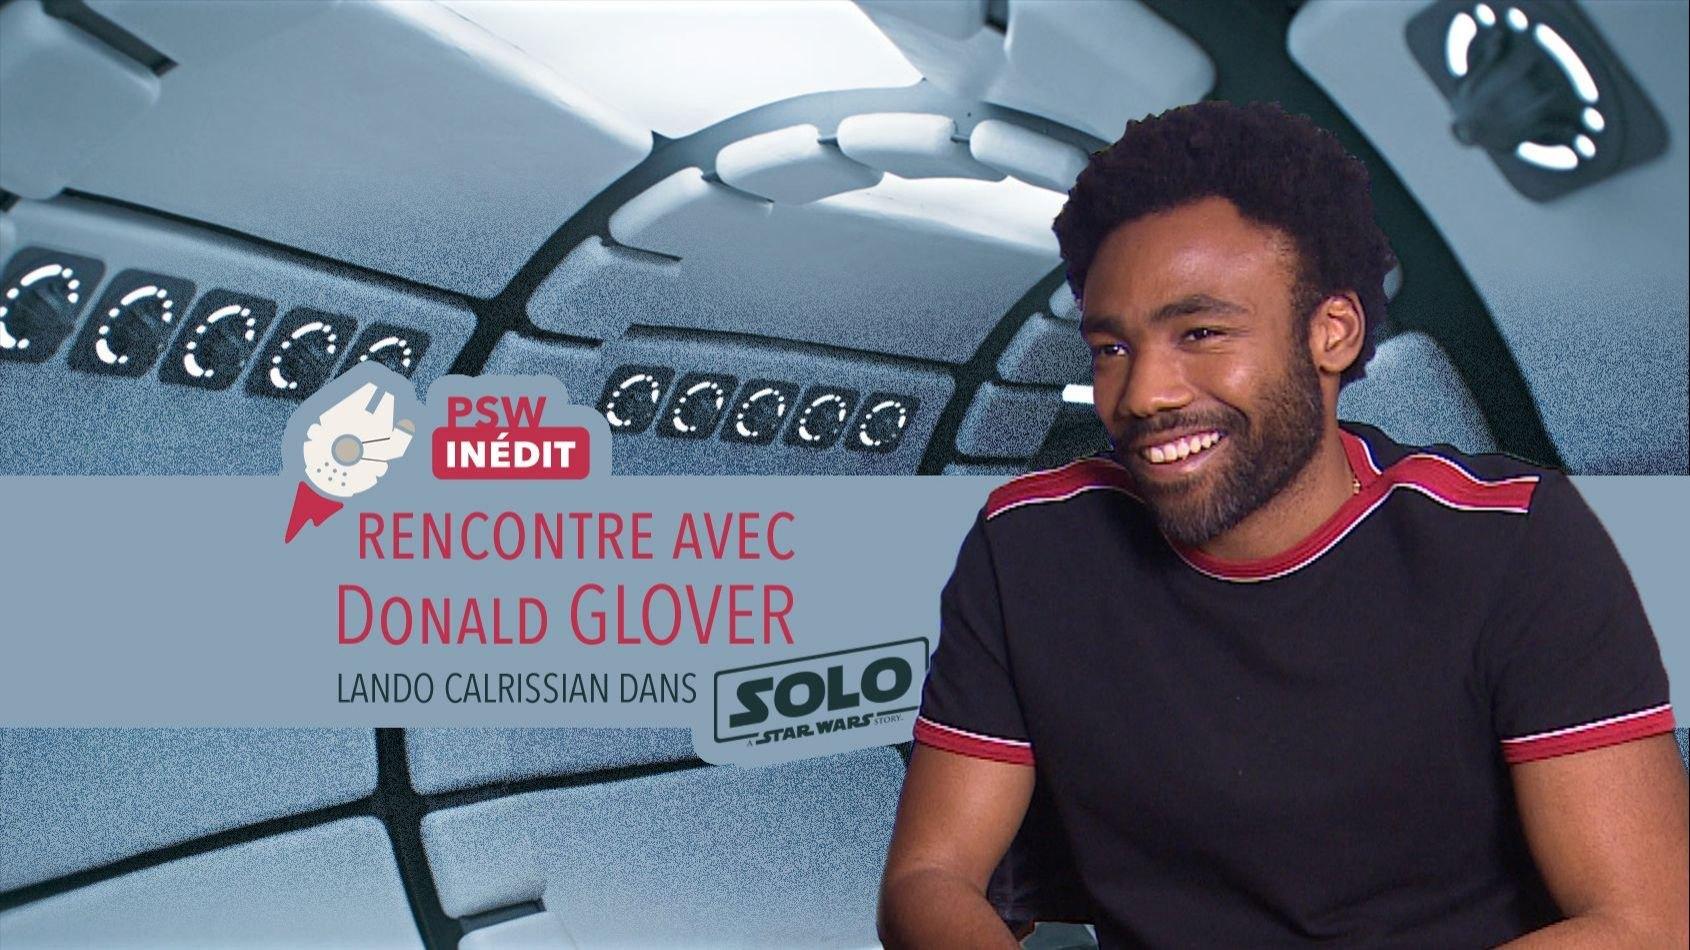 Notre Interview de Donald Glover alias Lando Calrissian dans Solo